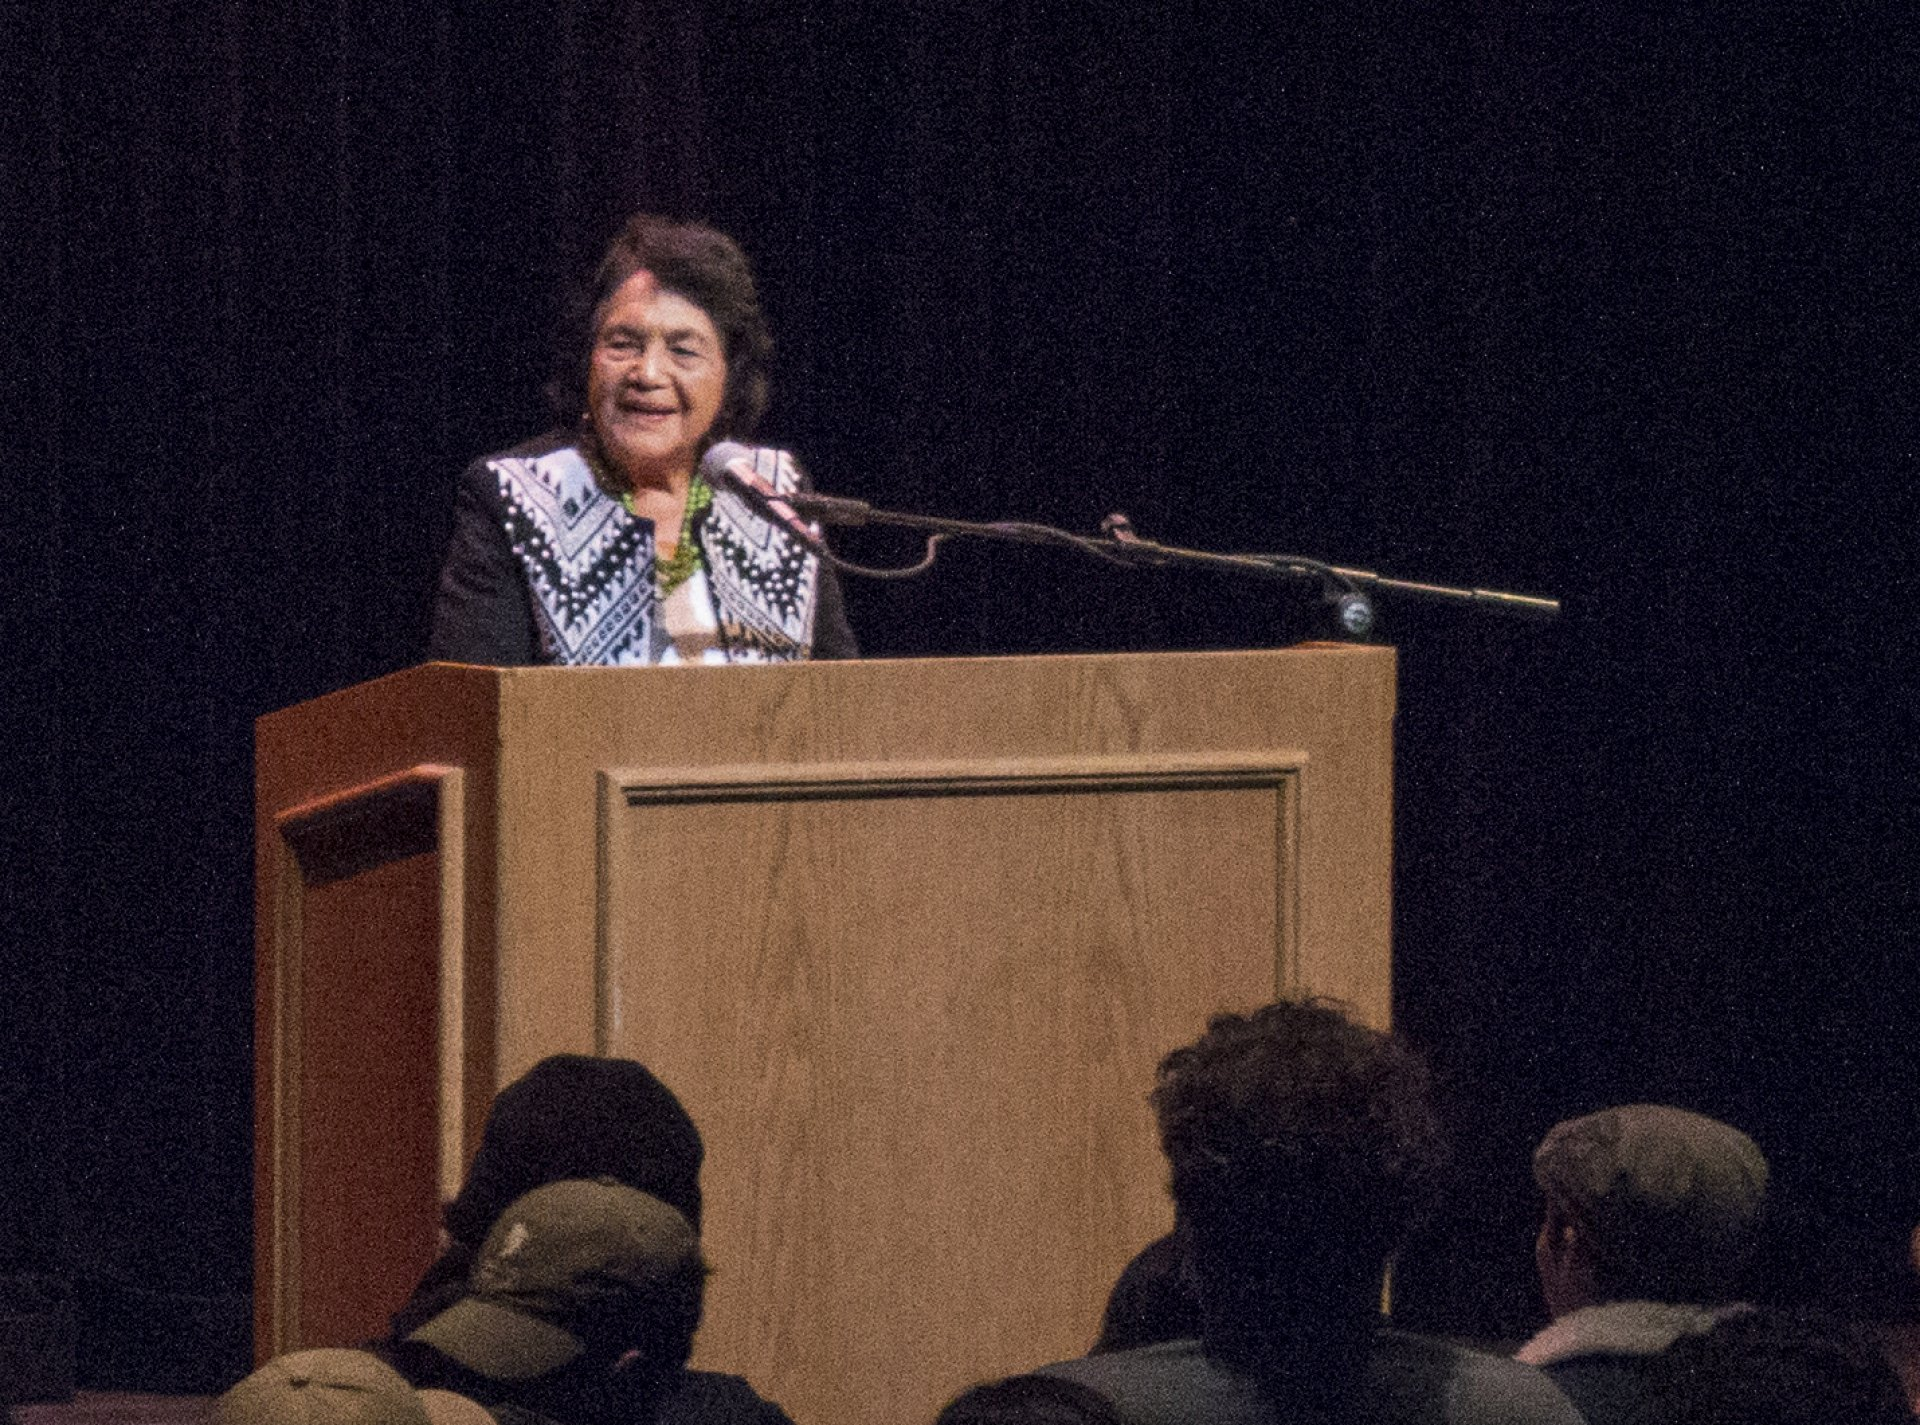 Dolores Huerta speaks at Humboldt State Universities' Van Duzer Theater, Monday, Nov. 13, 2017. Photo credit: Robert Brown